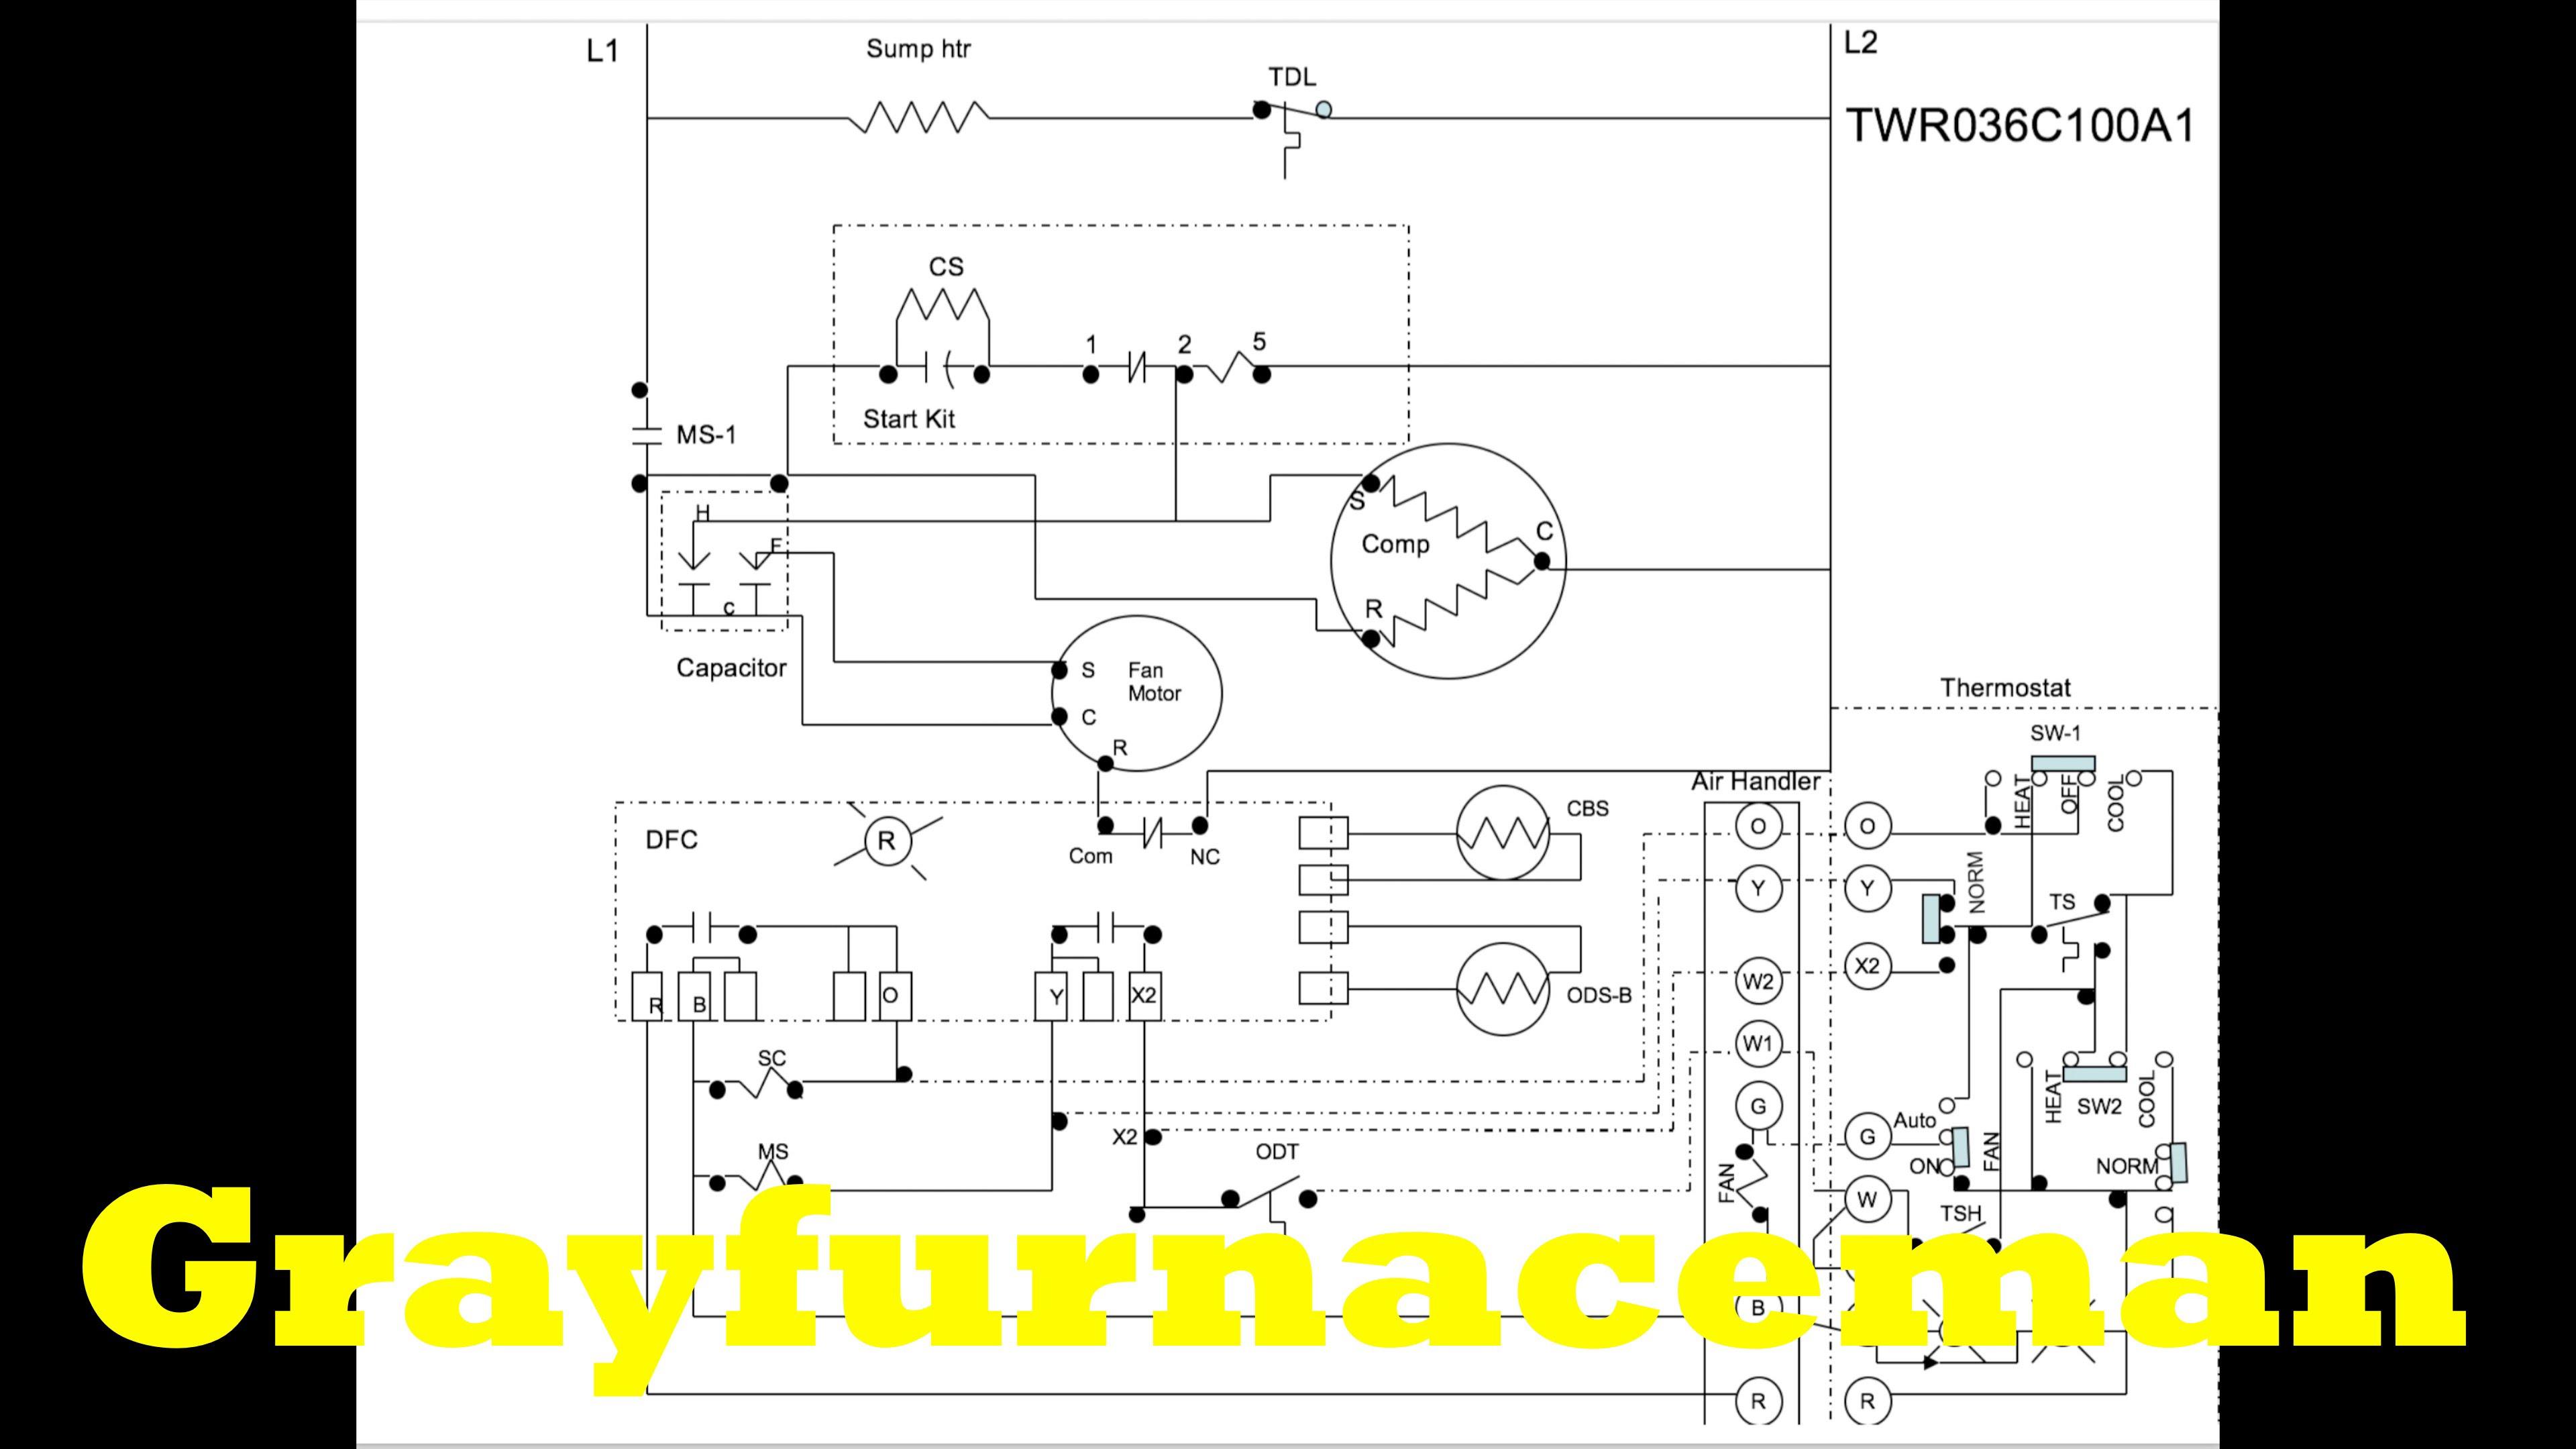 Goodman Heat Pump Thermostat Wiring Diagram | Schematic Diagram - Nest Thermostat Wiring Diagram Heat Pump